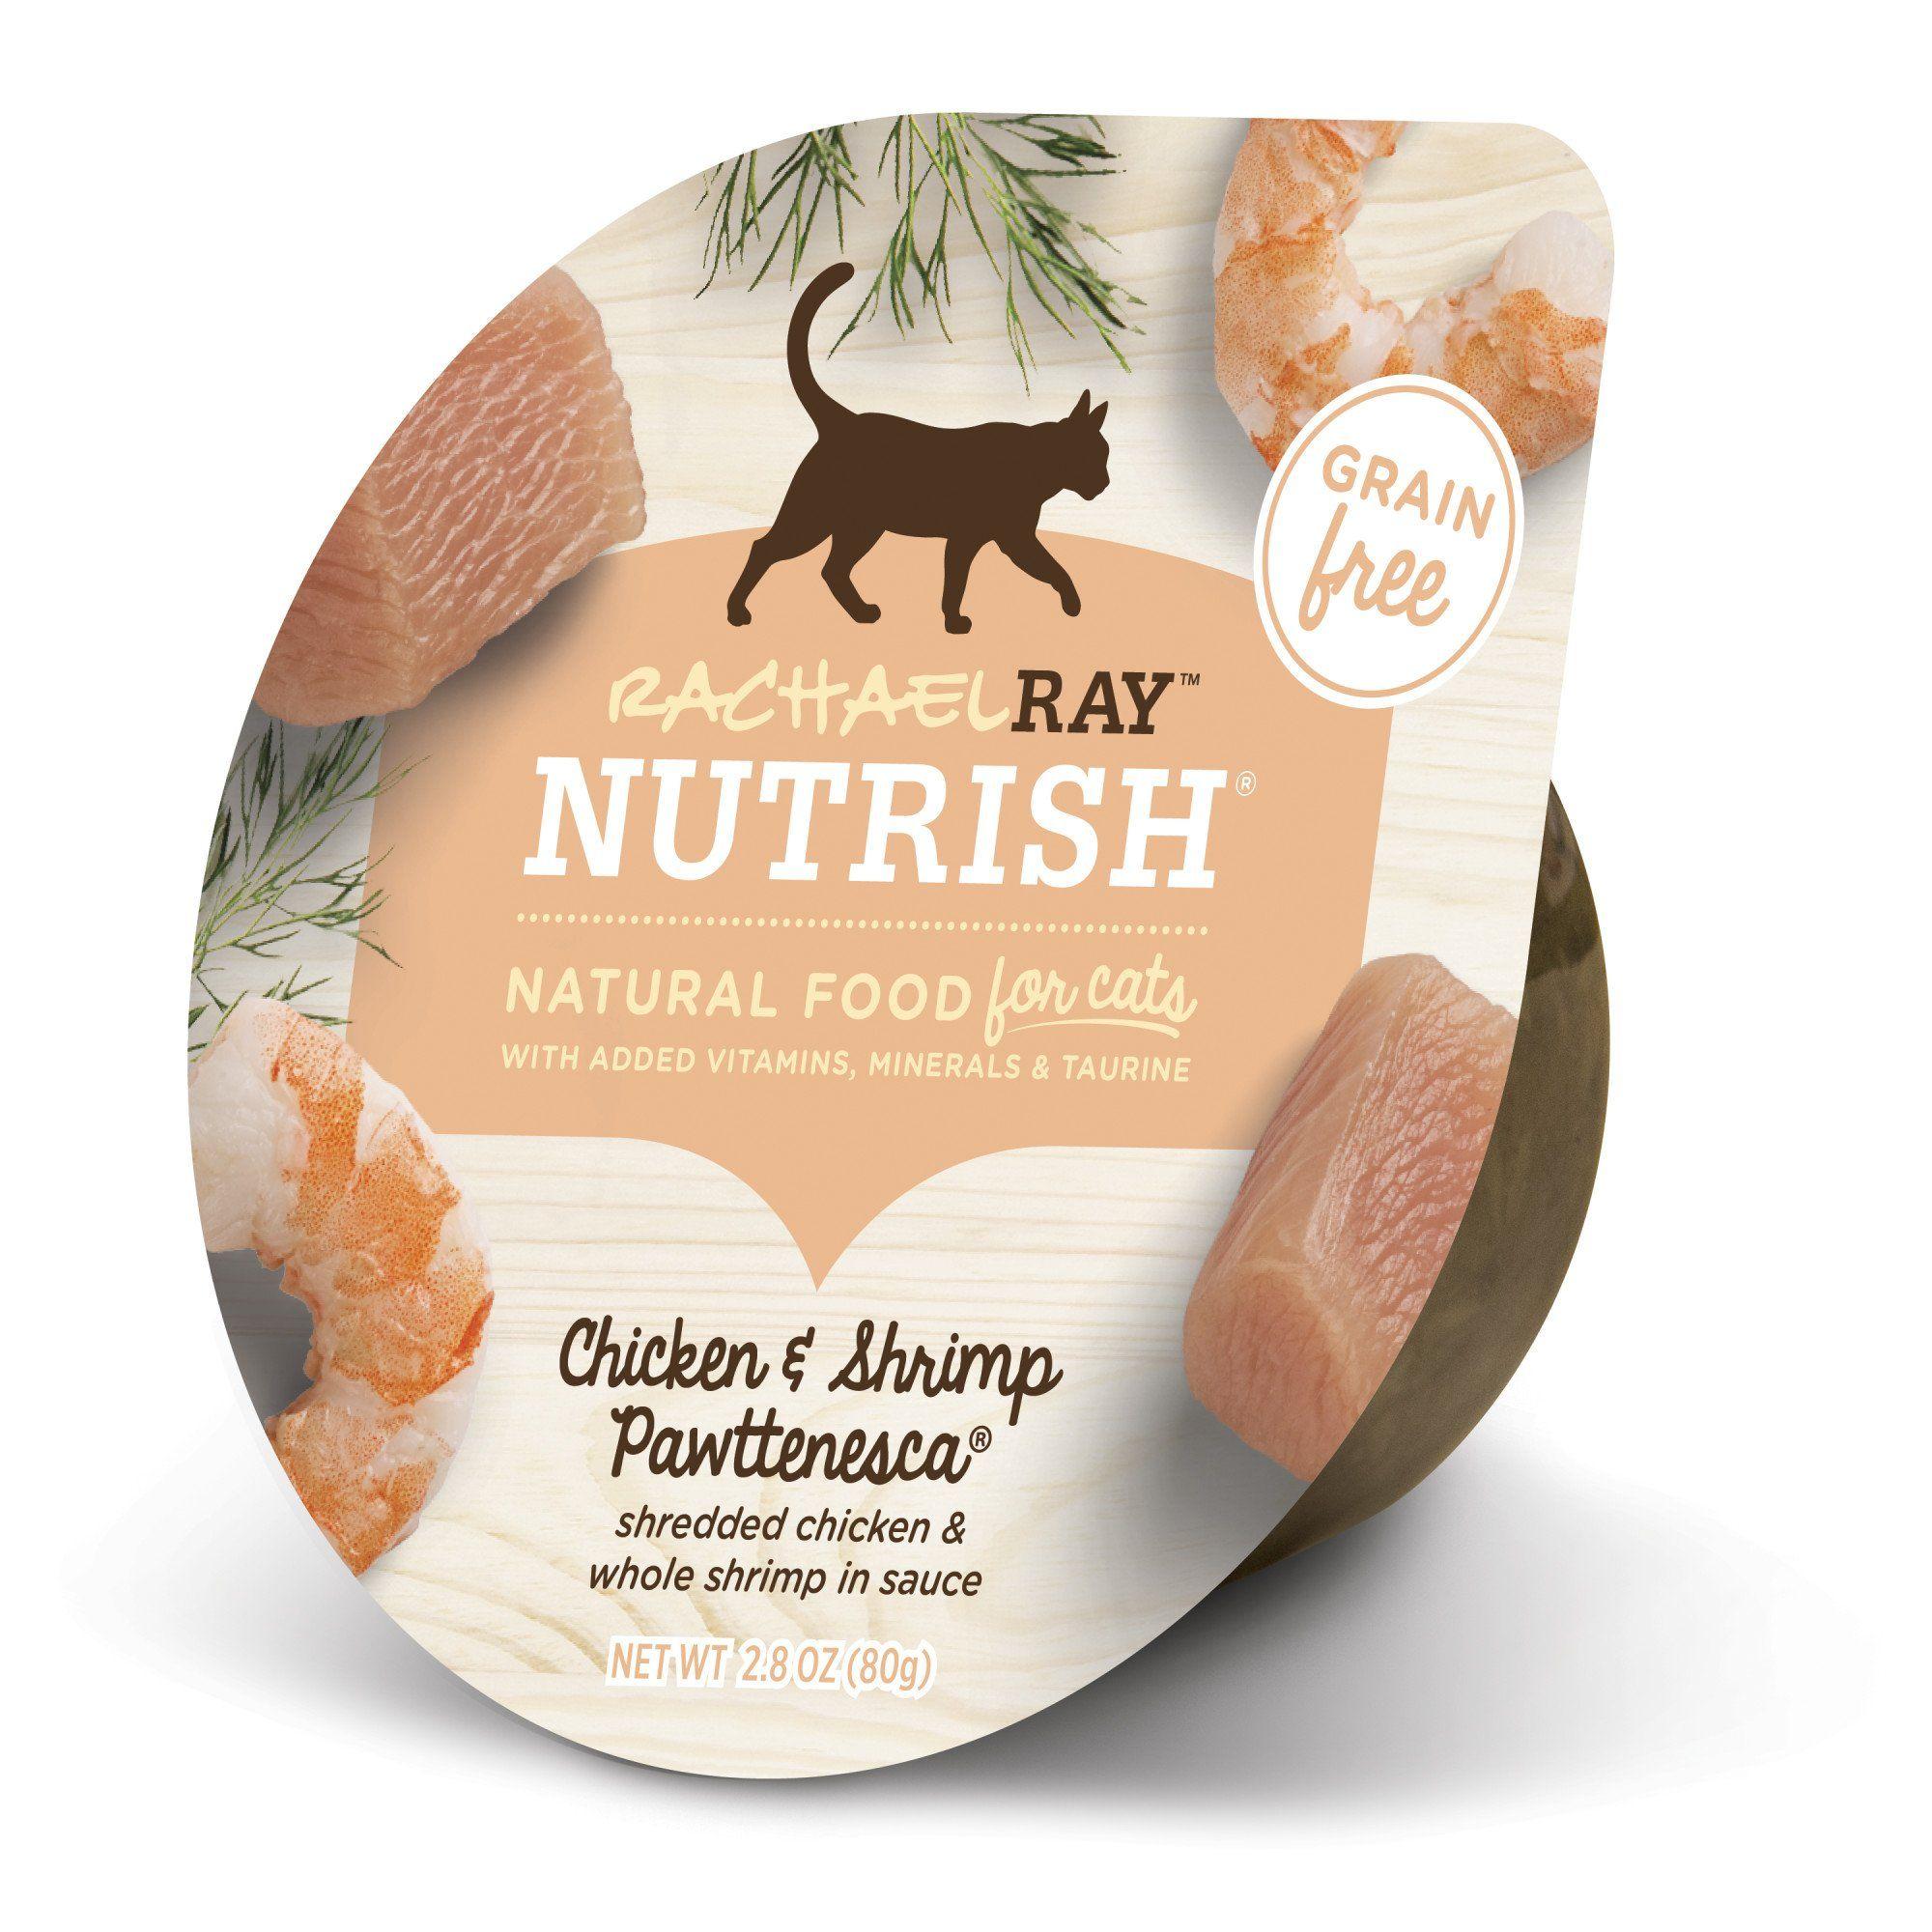 Rachael Ray Nutrish Natural Grain Free Chicken Shrimp